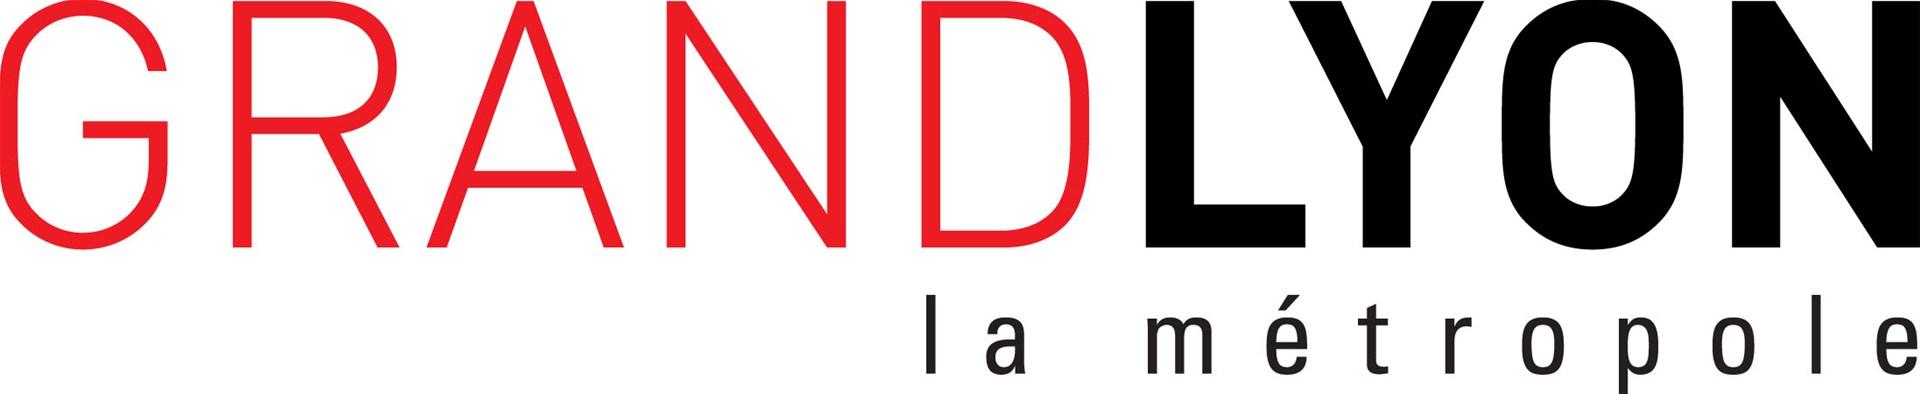 ffrandonnee rhone logo grand lyon